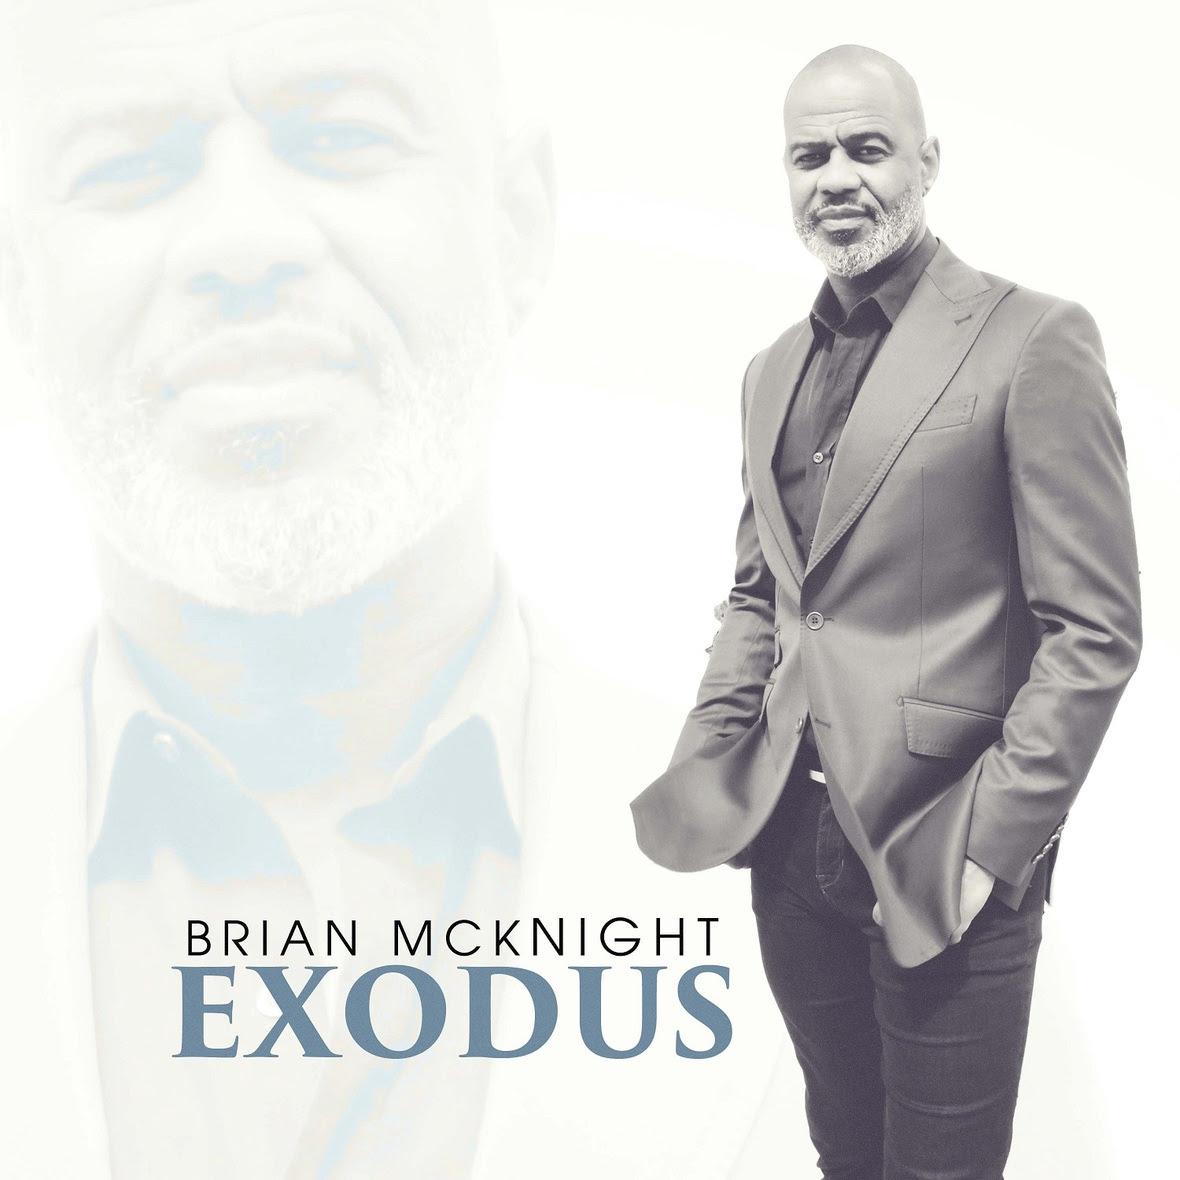 BRIAN MCKNIGHT EXODUS